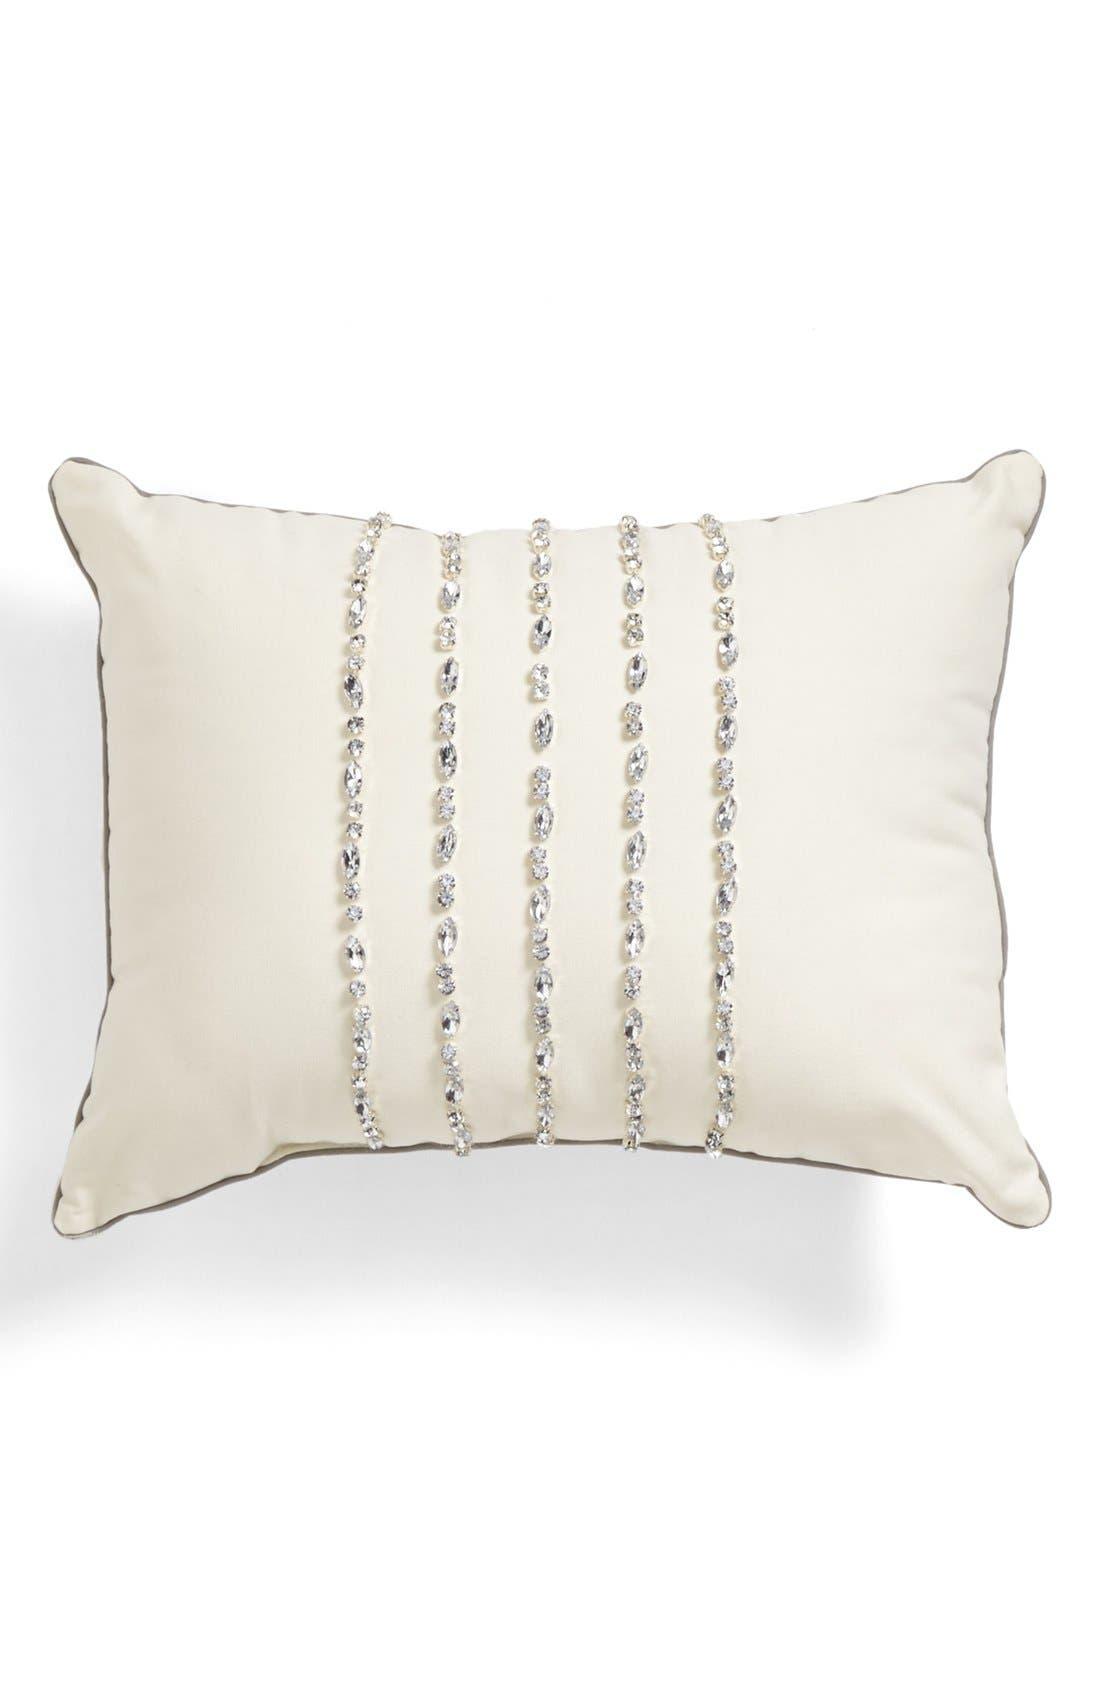 Main Image - Laundry by Shelli Segal 'Alexa' Pillow